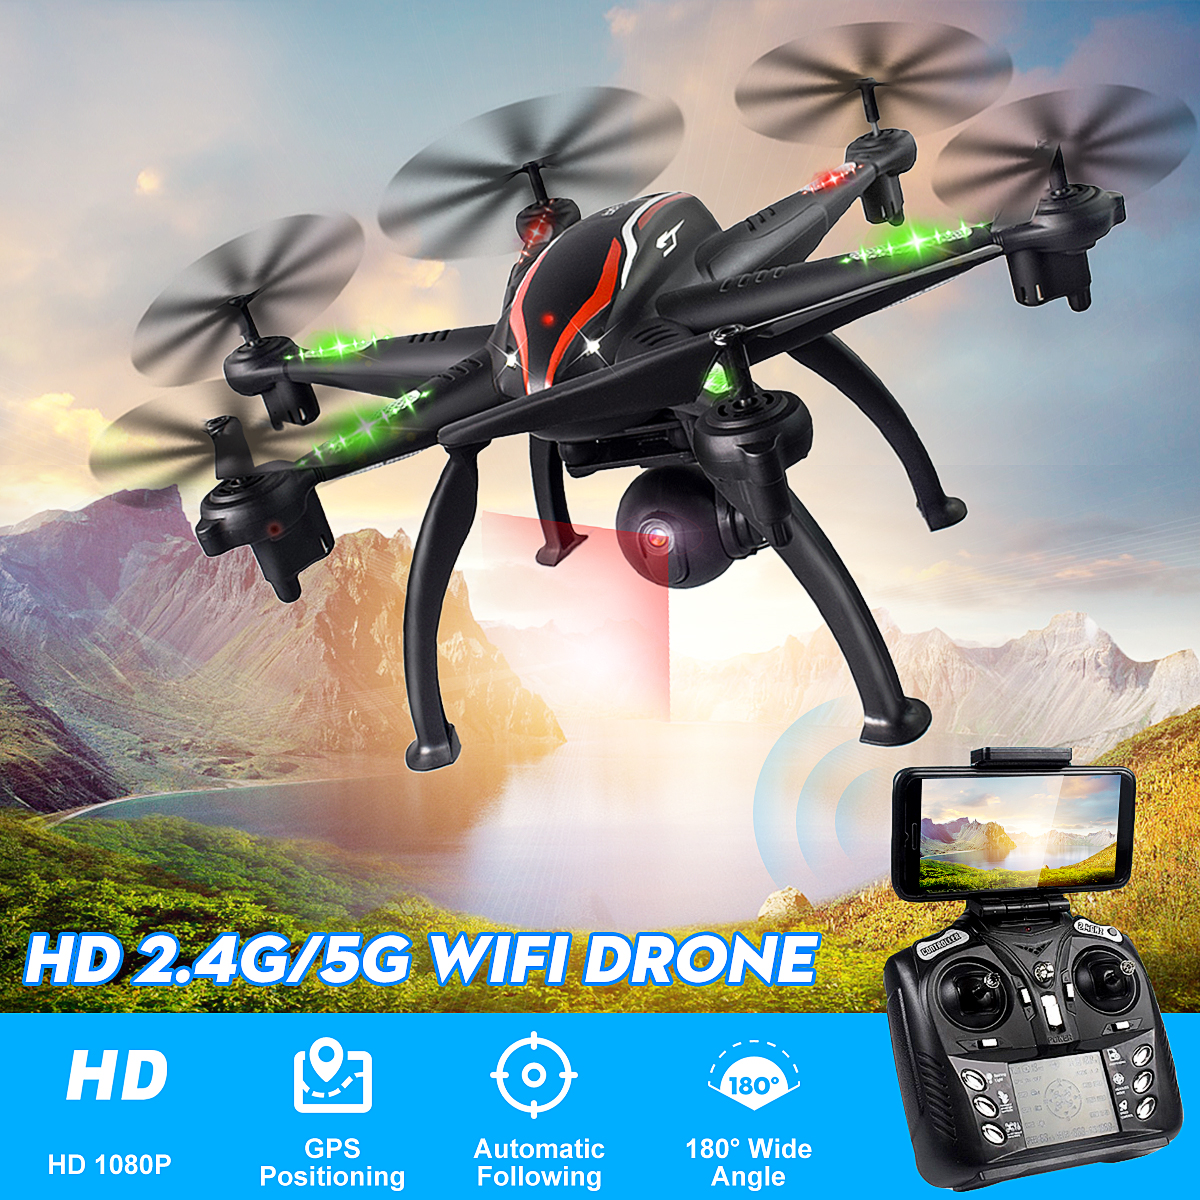 RC Drone GPS 5G WiFi 1080P Camera Smart Follow Mode 6 Axis Gyro Quadcopter Professional 5G WiFi Drone Aerial PhotographyRC Drone GPS 5G WiFi 1080P Camera Smart Follow Mode 6 Axis Gyro Quadcopter Professional 5G WiFi Drone Aerial Photography